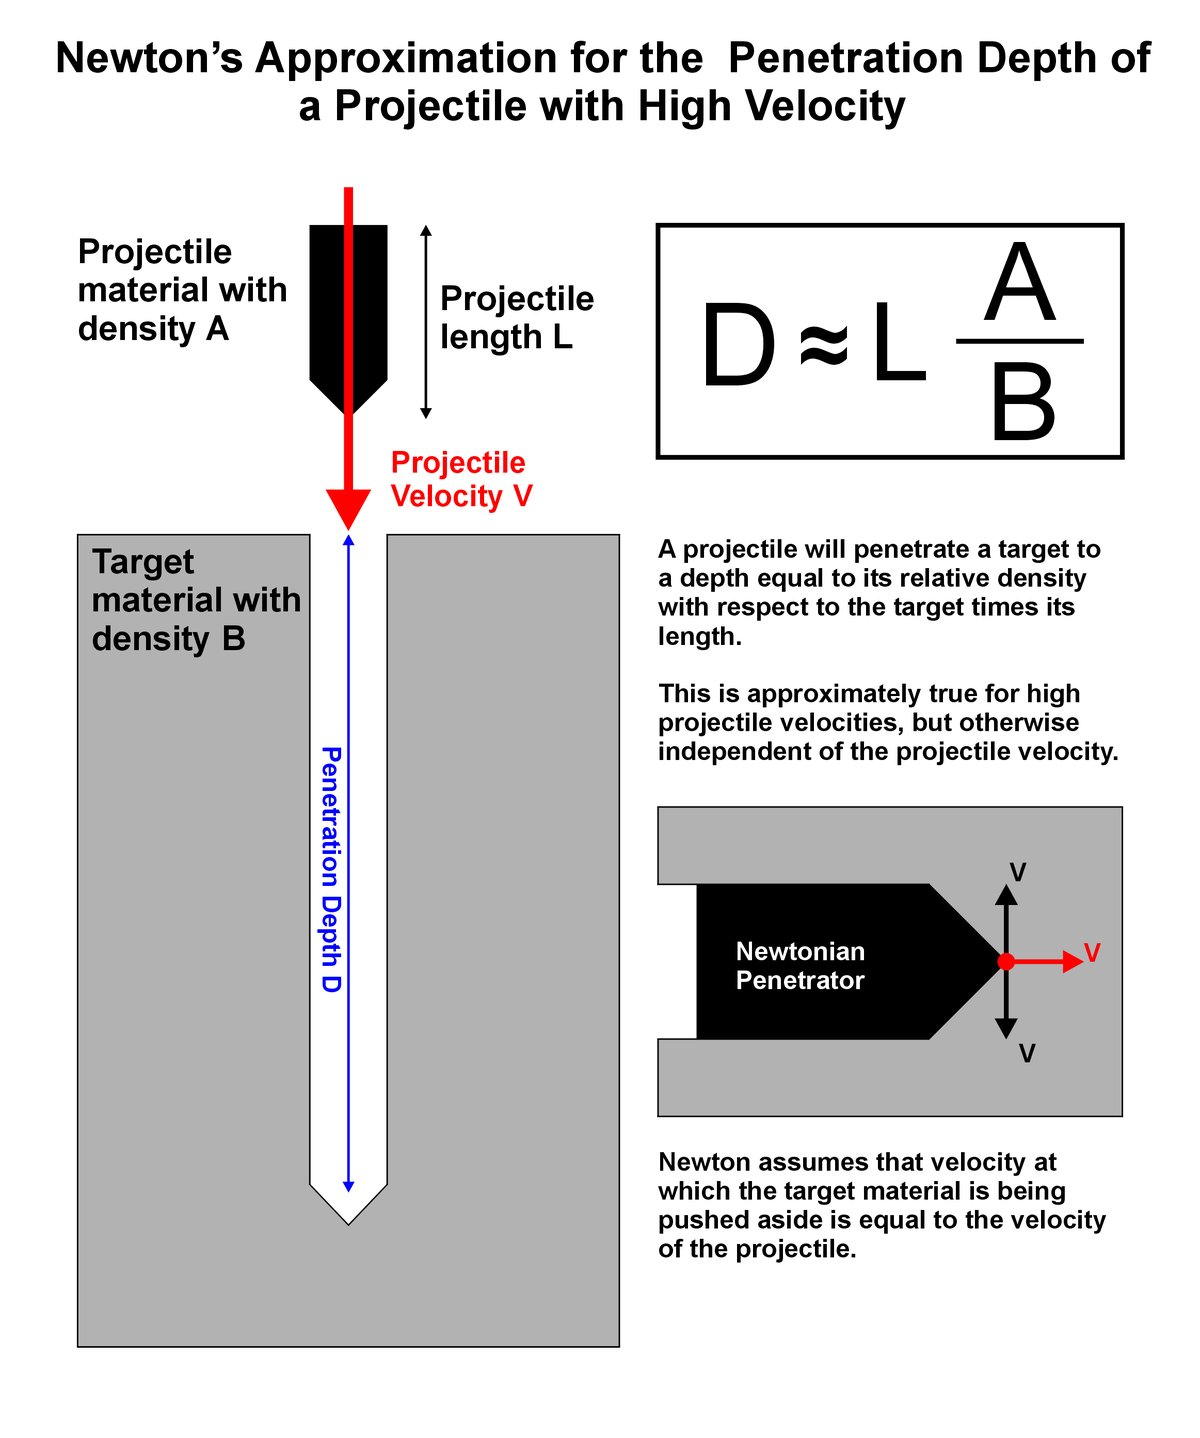 Projectile momentum versus penetration